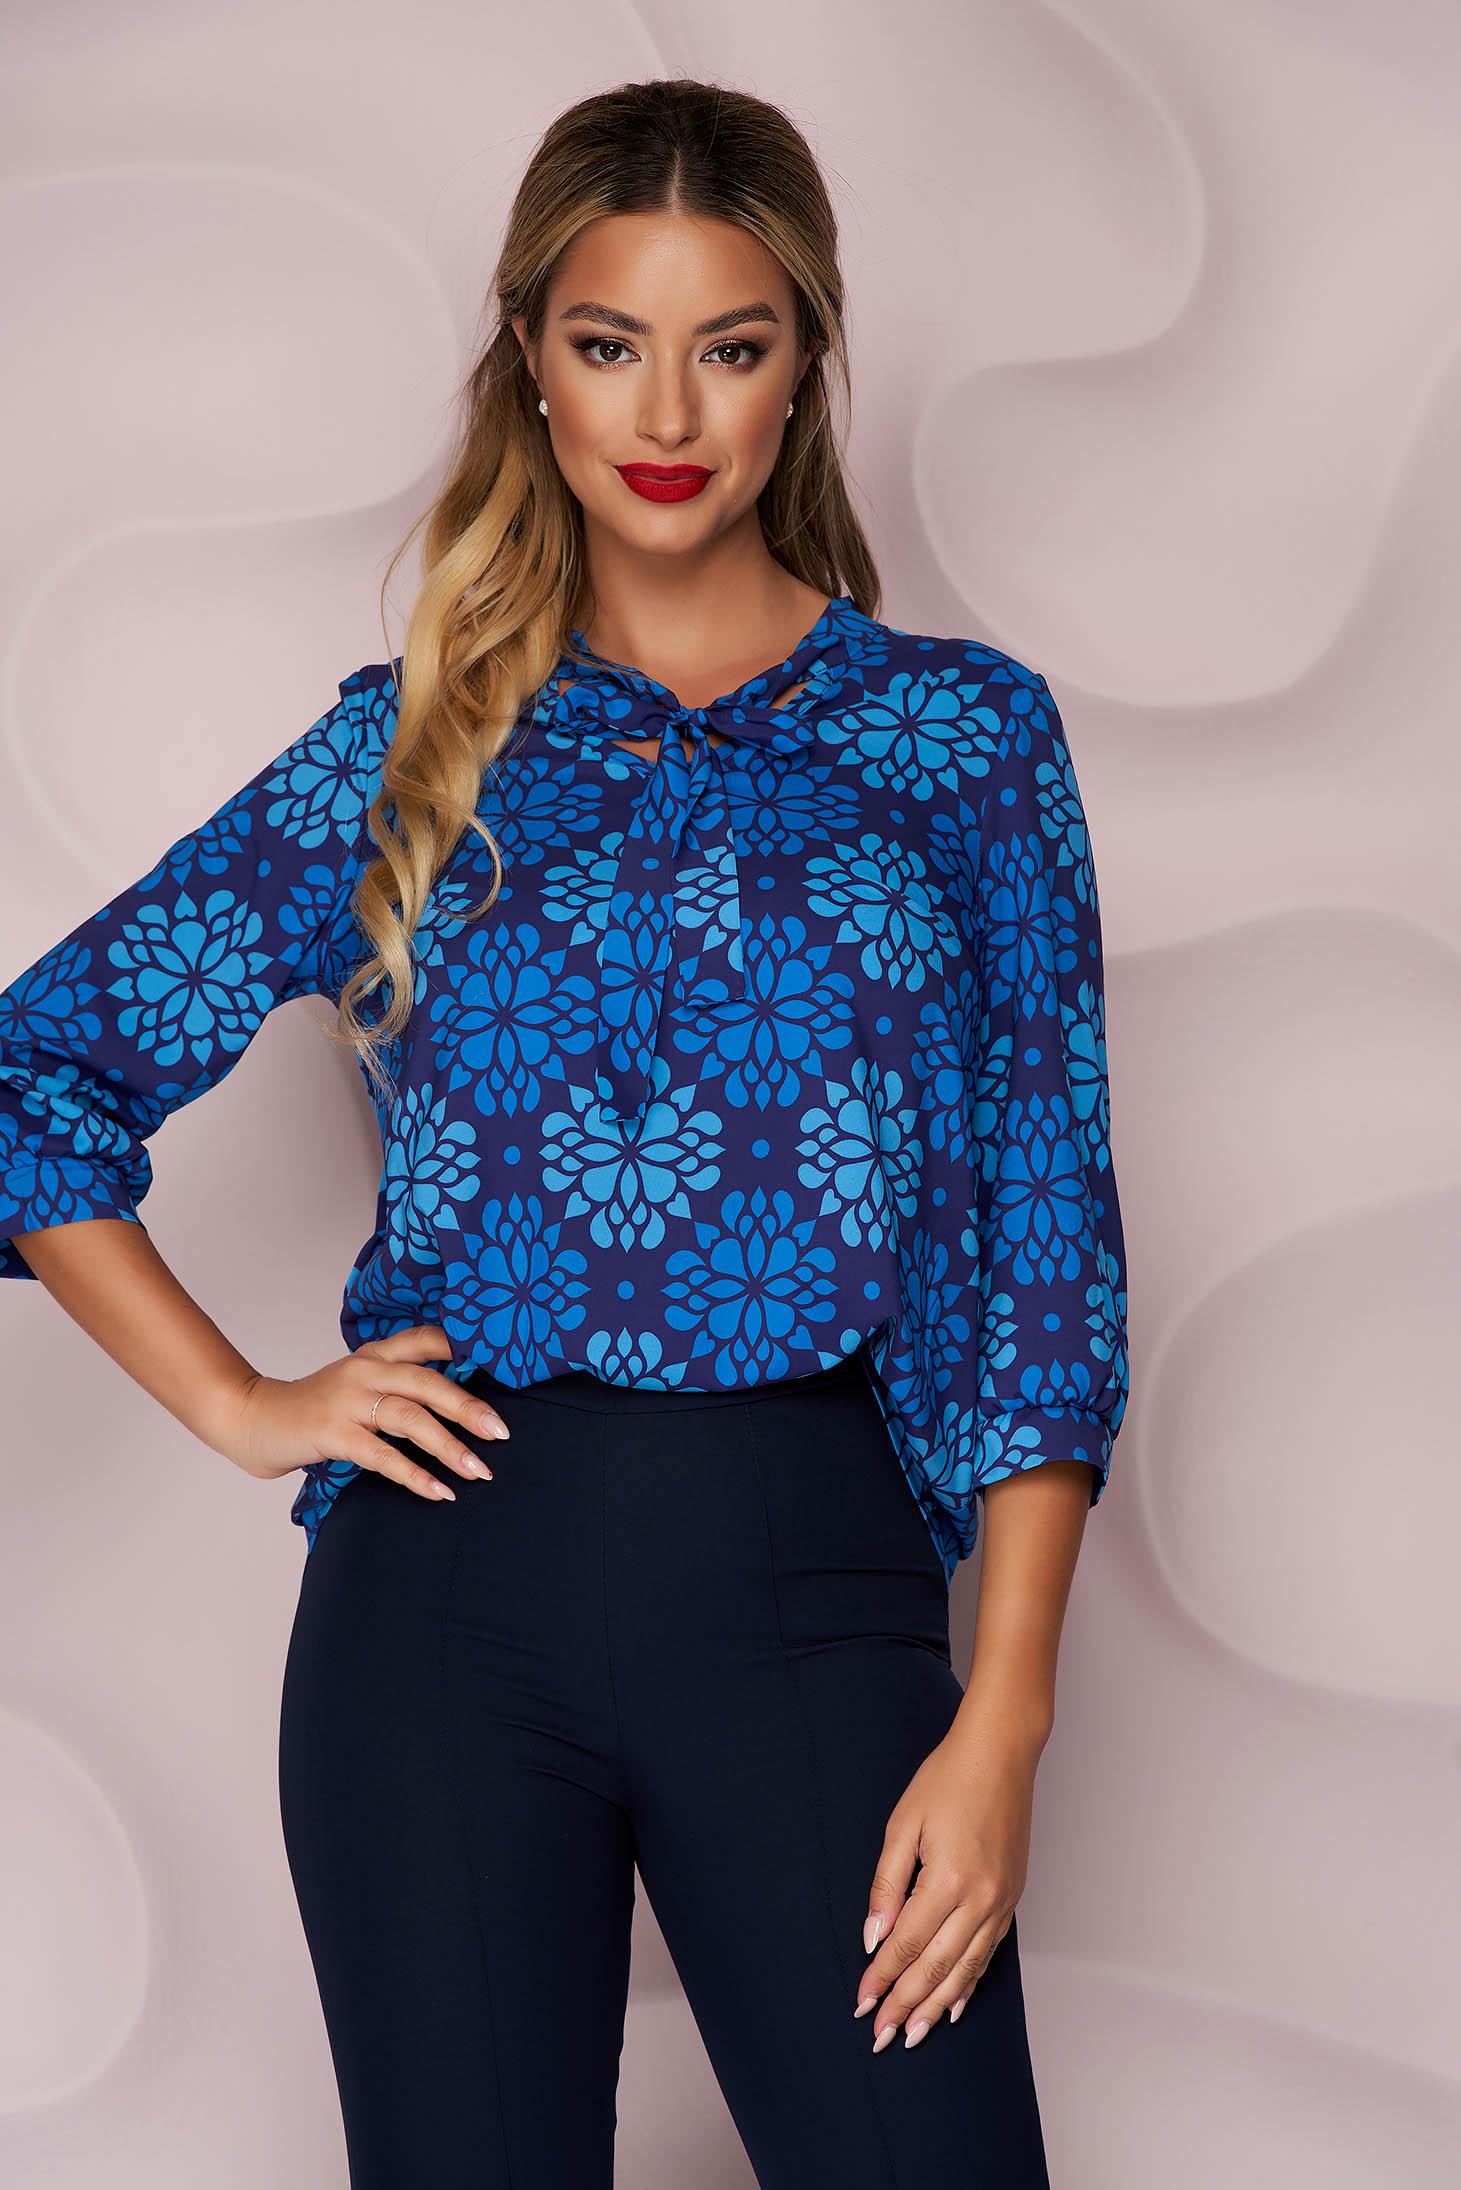 Bluza dama StarShinerS albastru-inchis office cu croi larg asimetrica din material neelastic si imprimeu floral unic